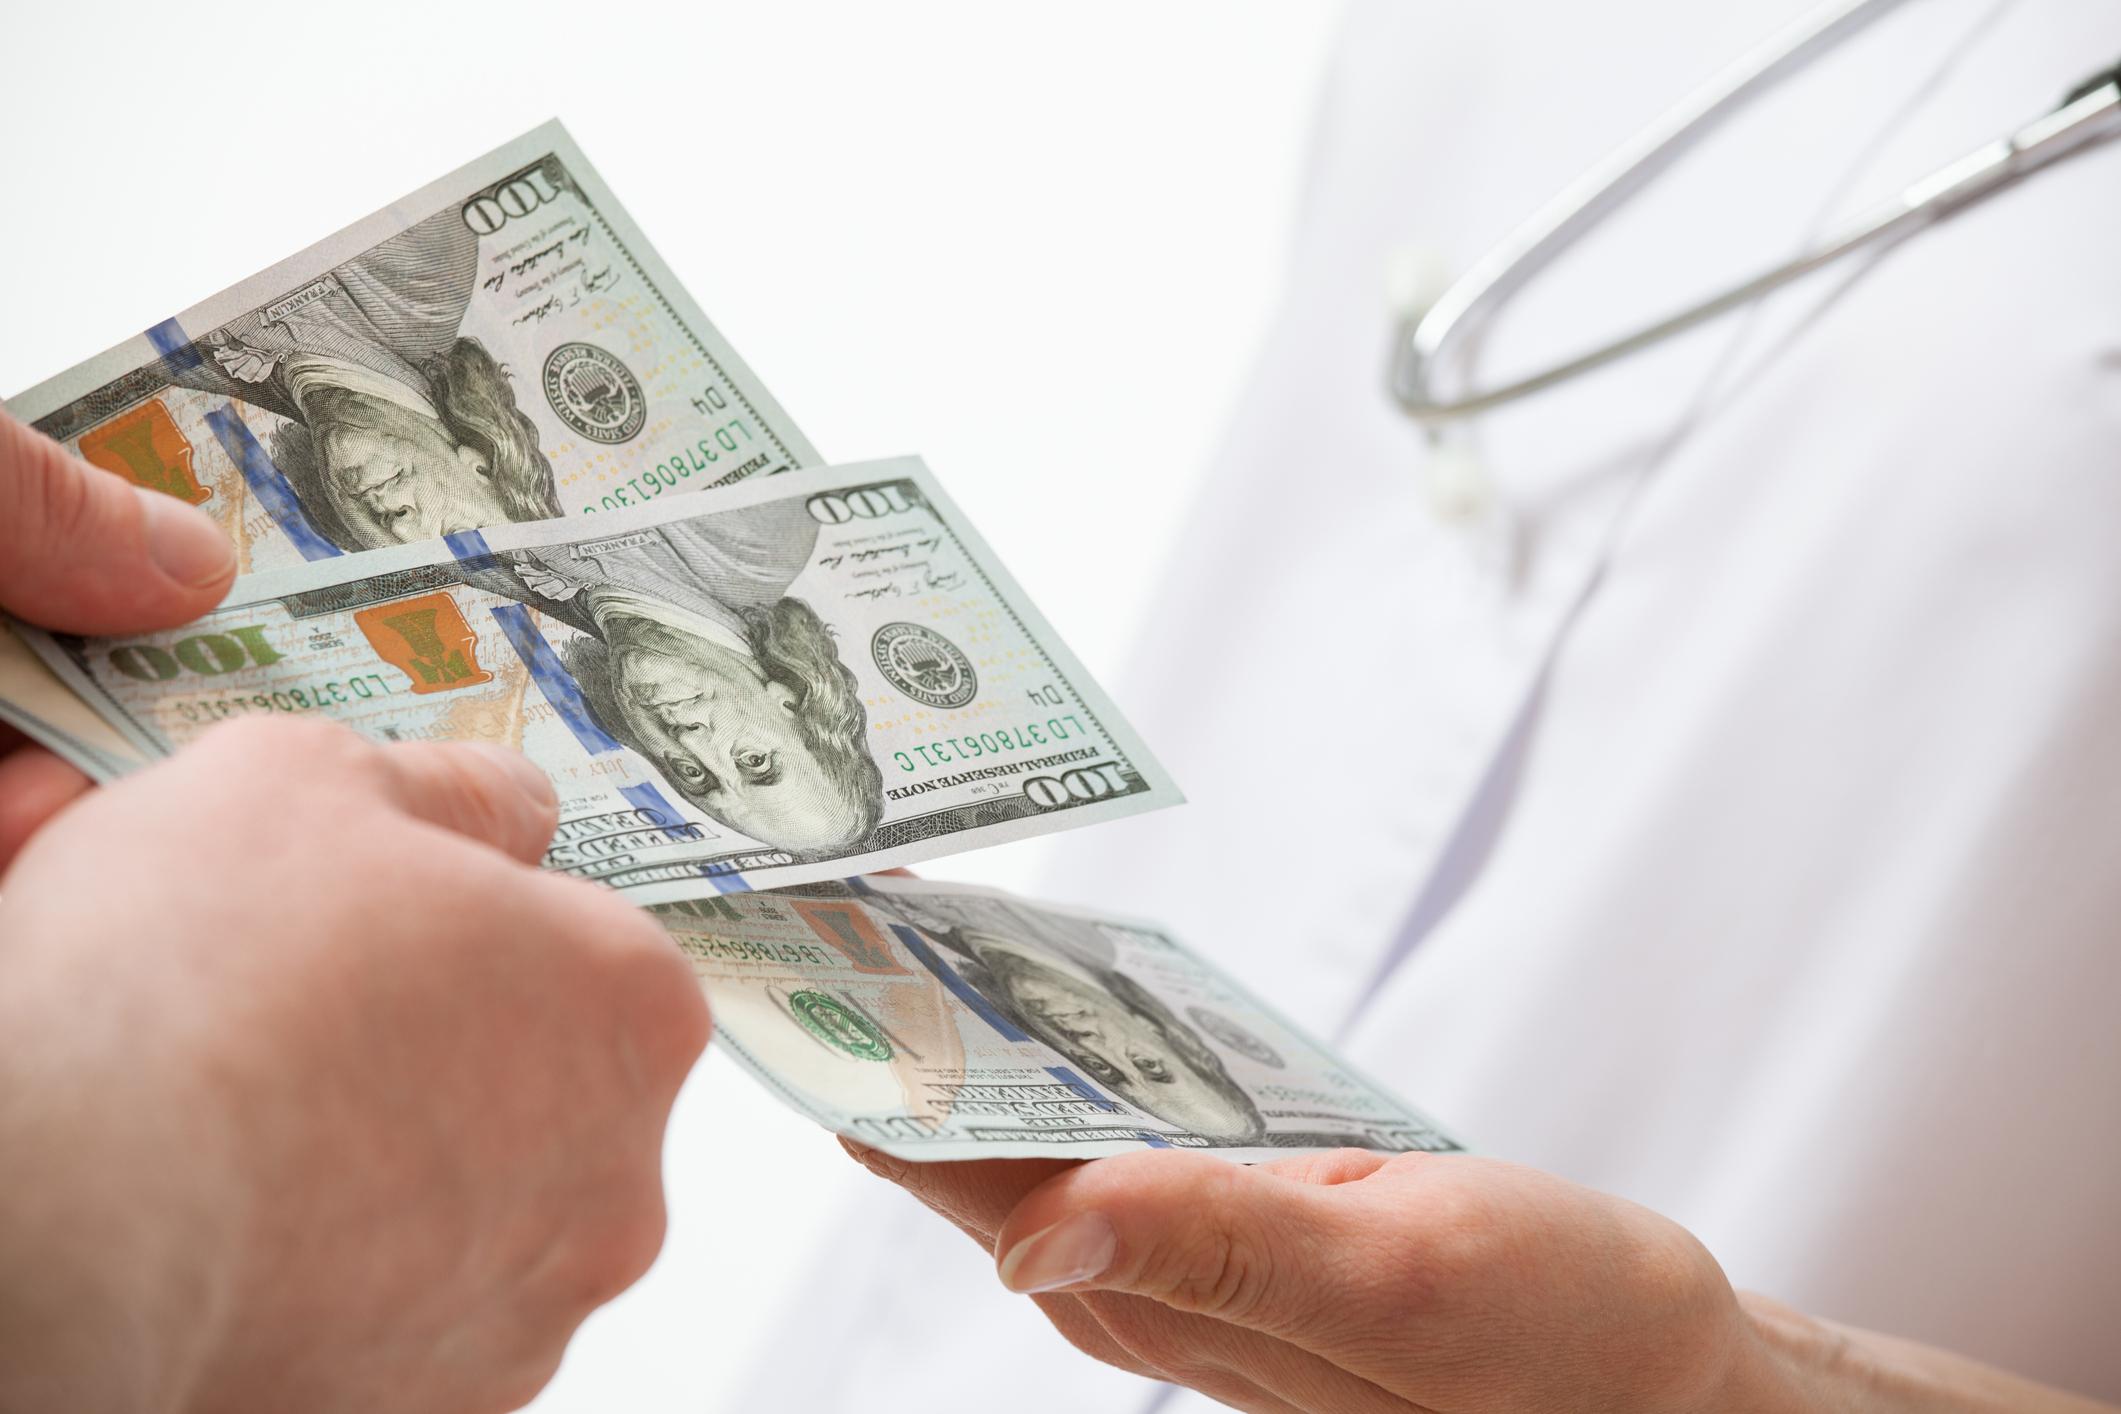 Patient handing cash to a doctor.